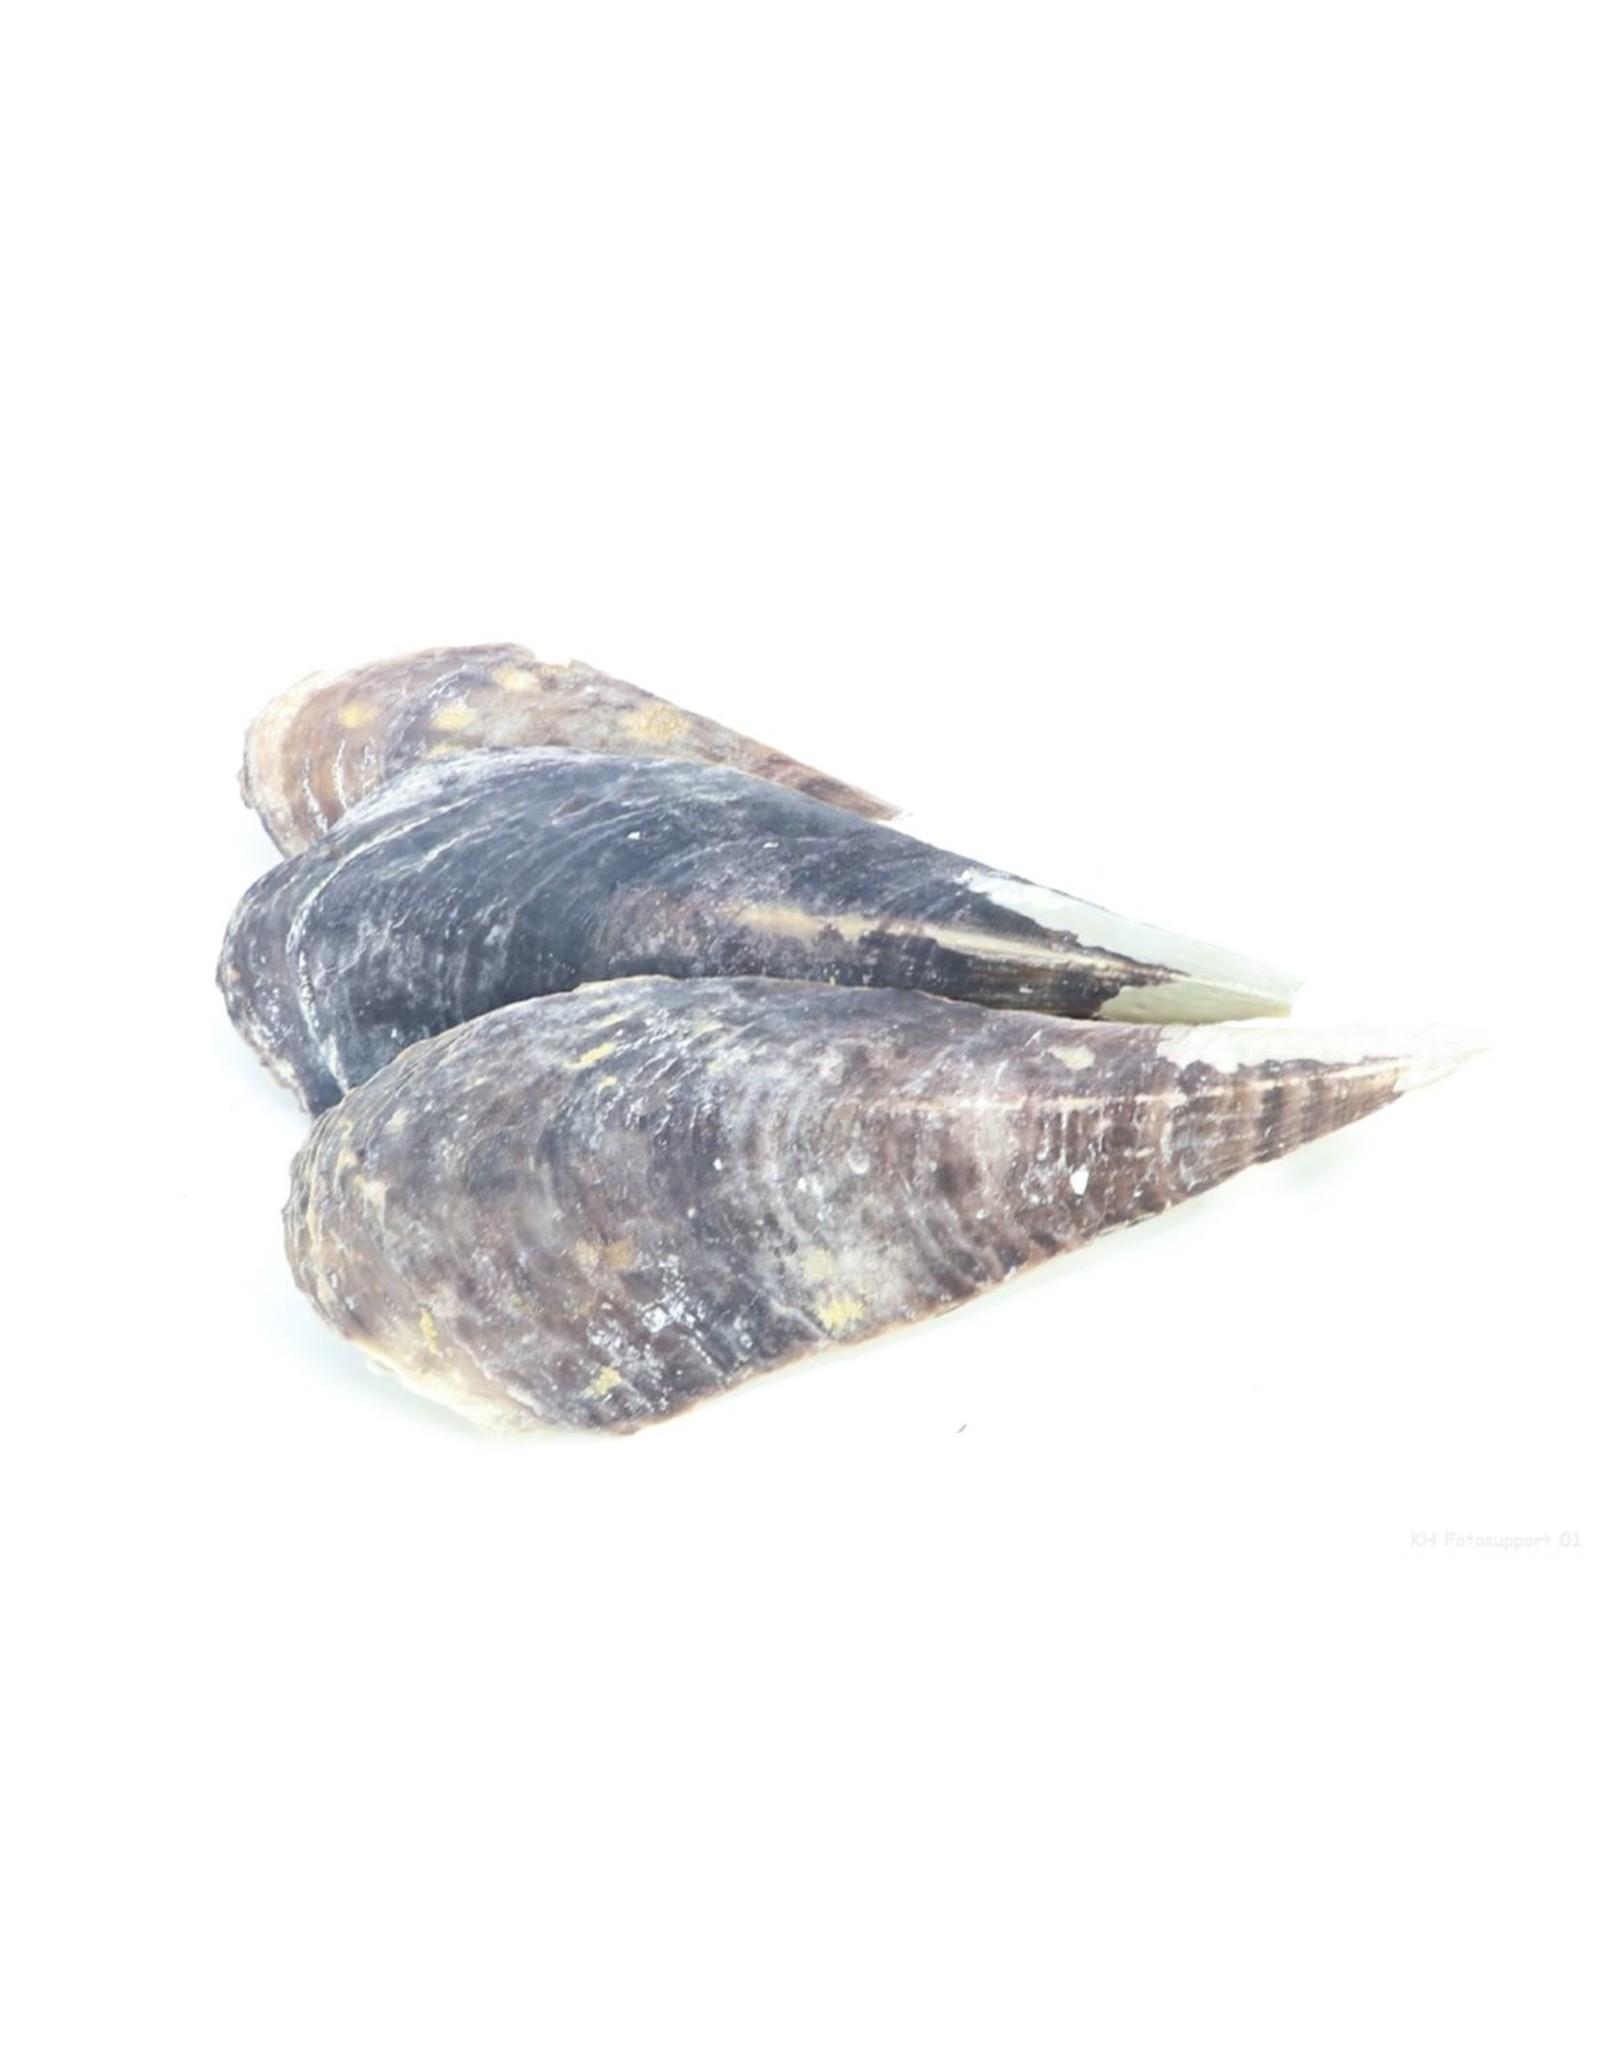 HD Basic Shell Pinnidae Penshell 1kg x 16